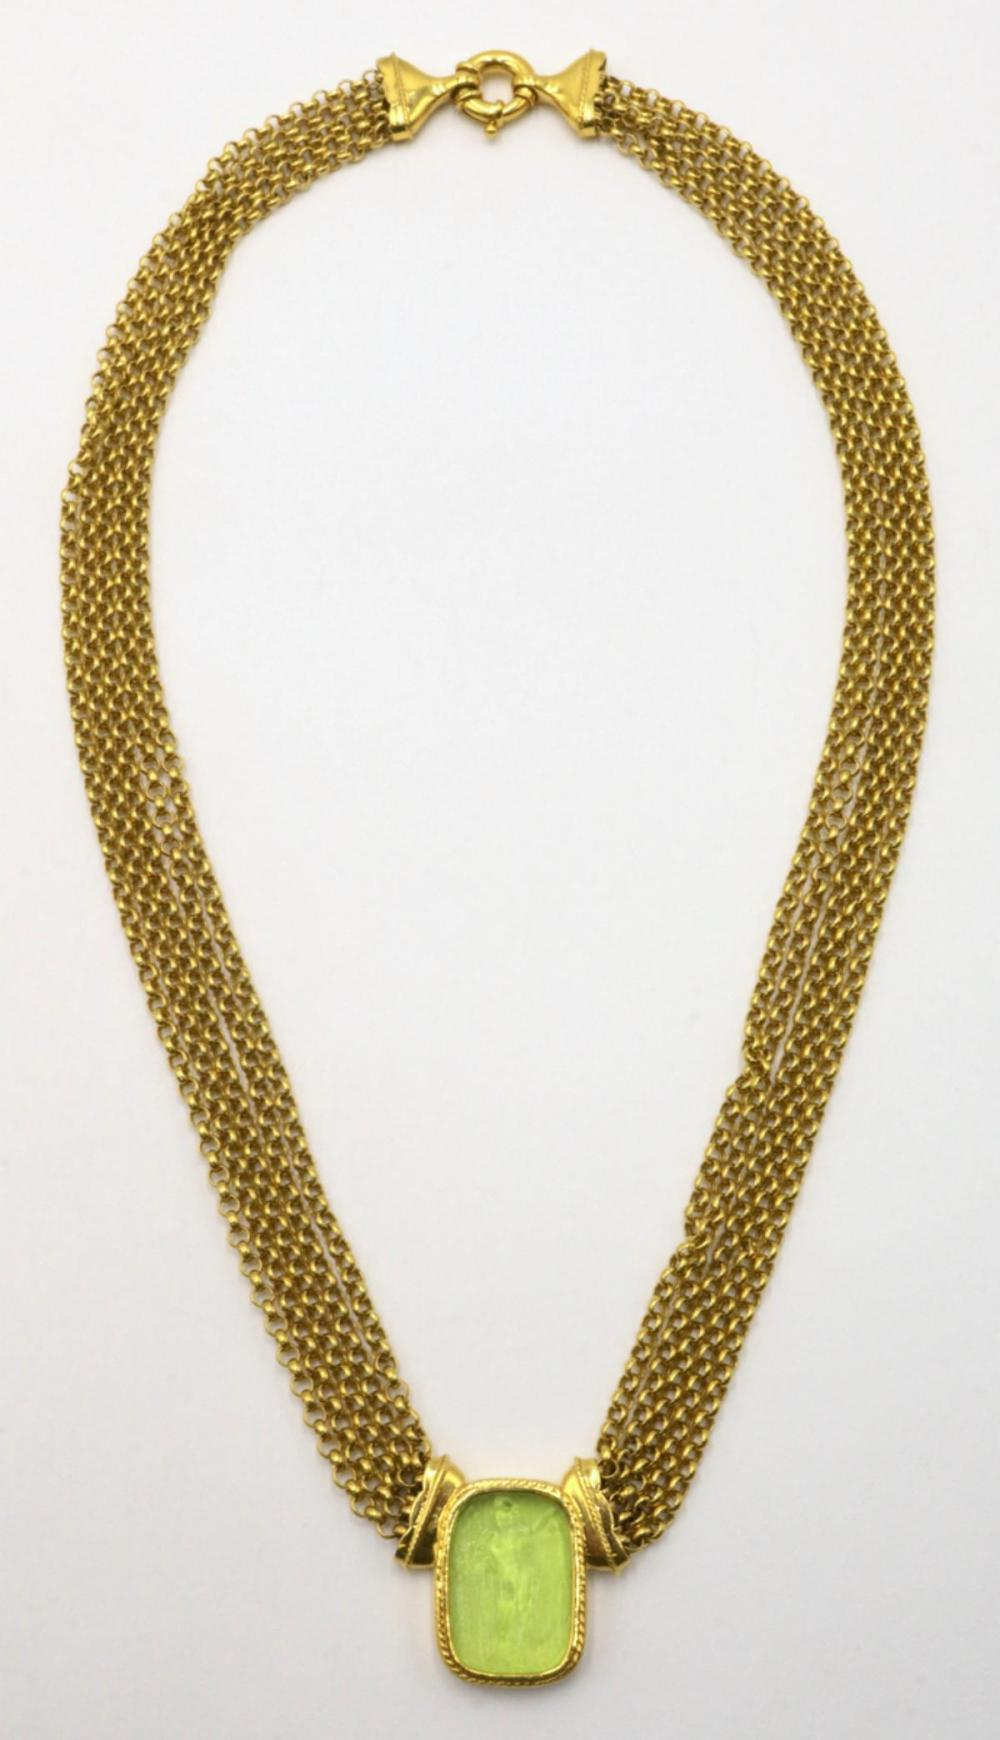 14Kt & Intaglio Peridot Necklace